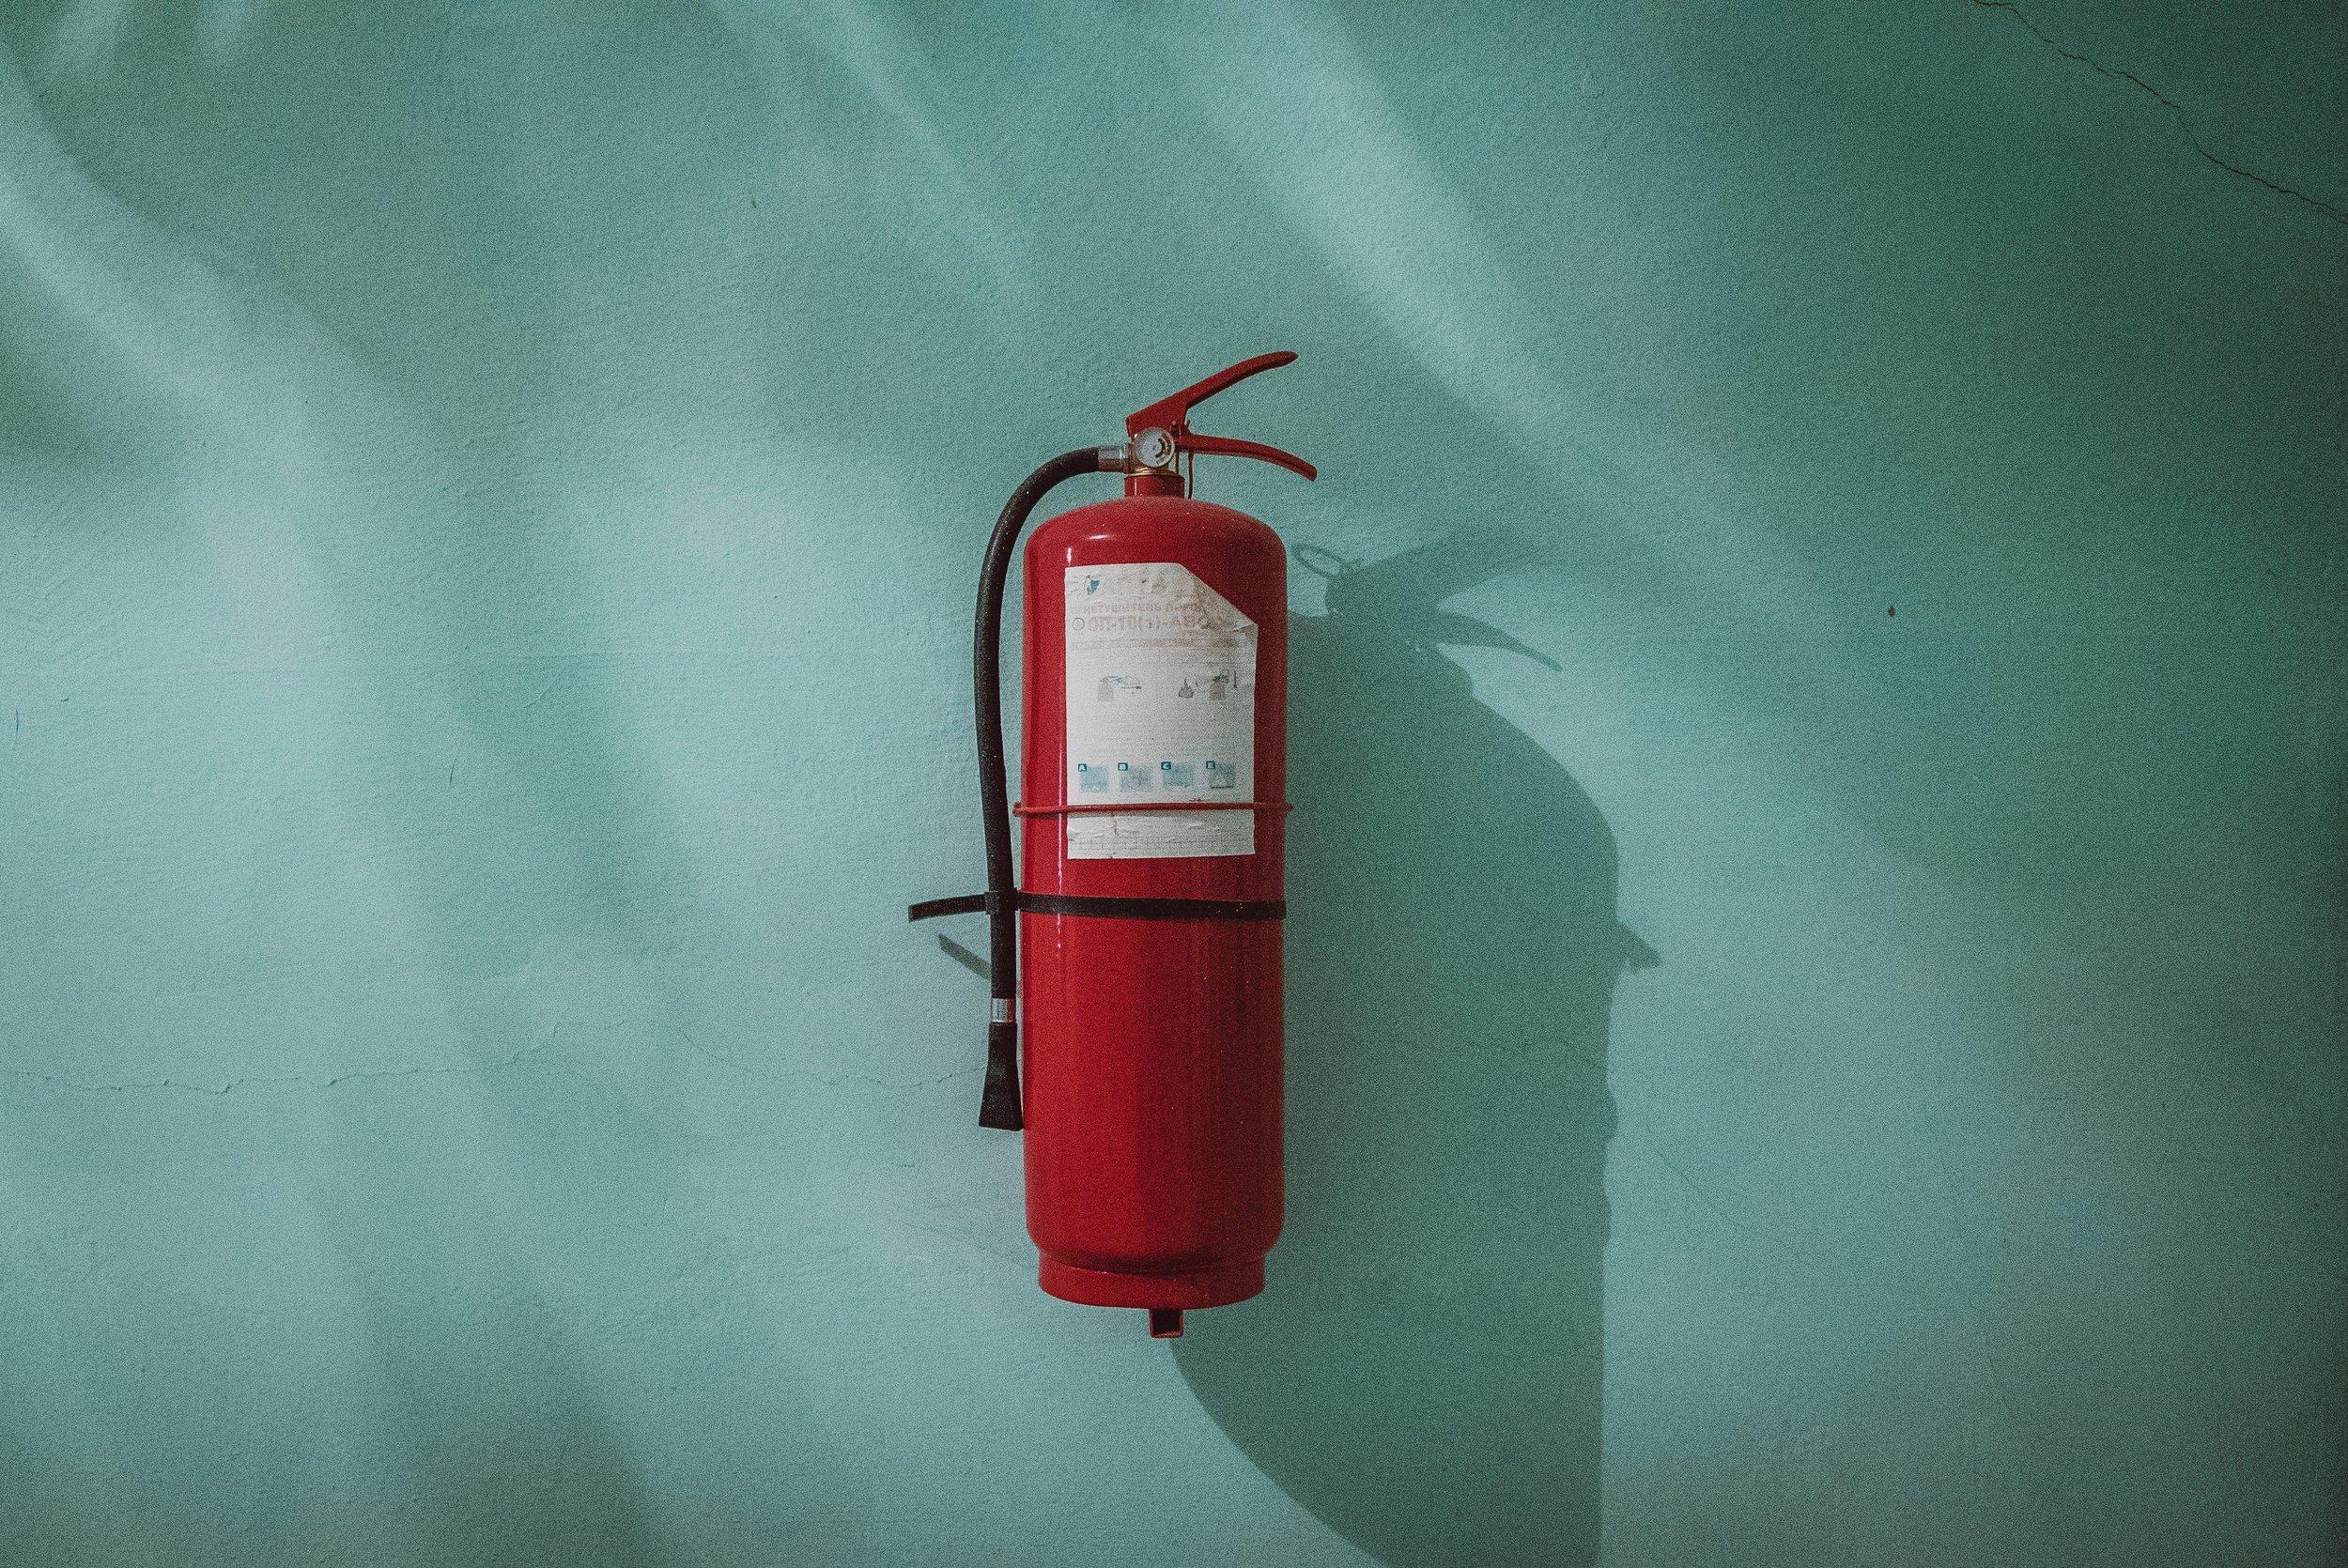 Safety Precautions -